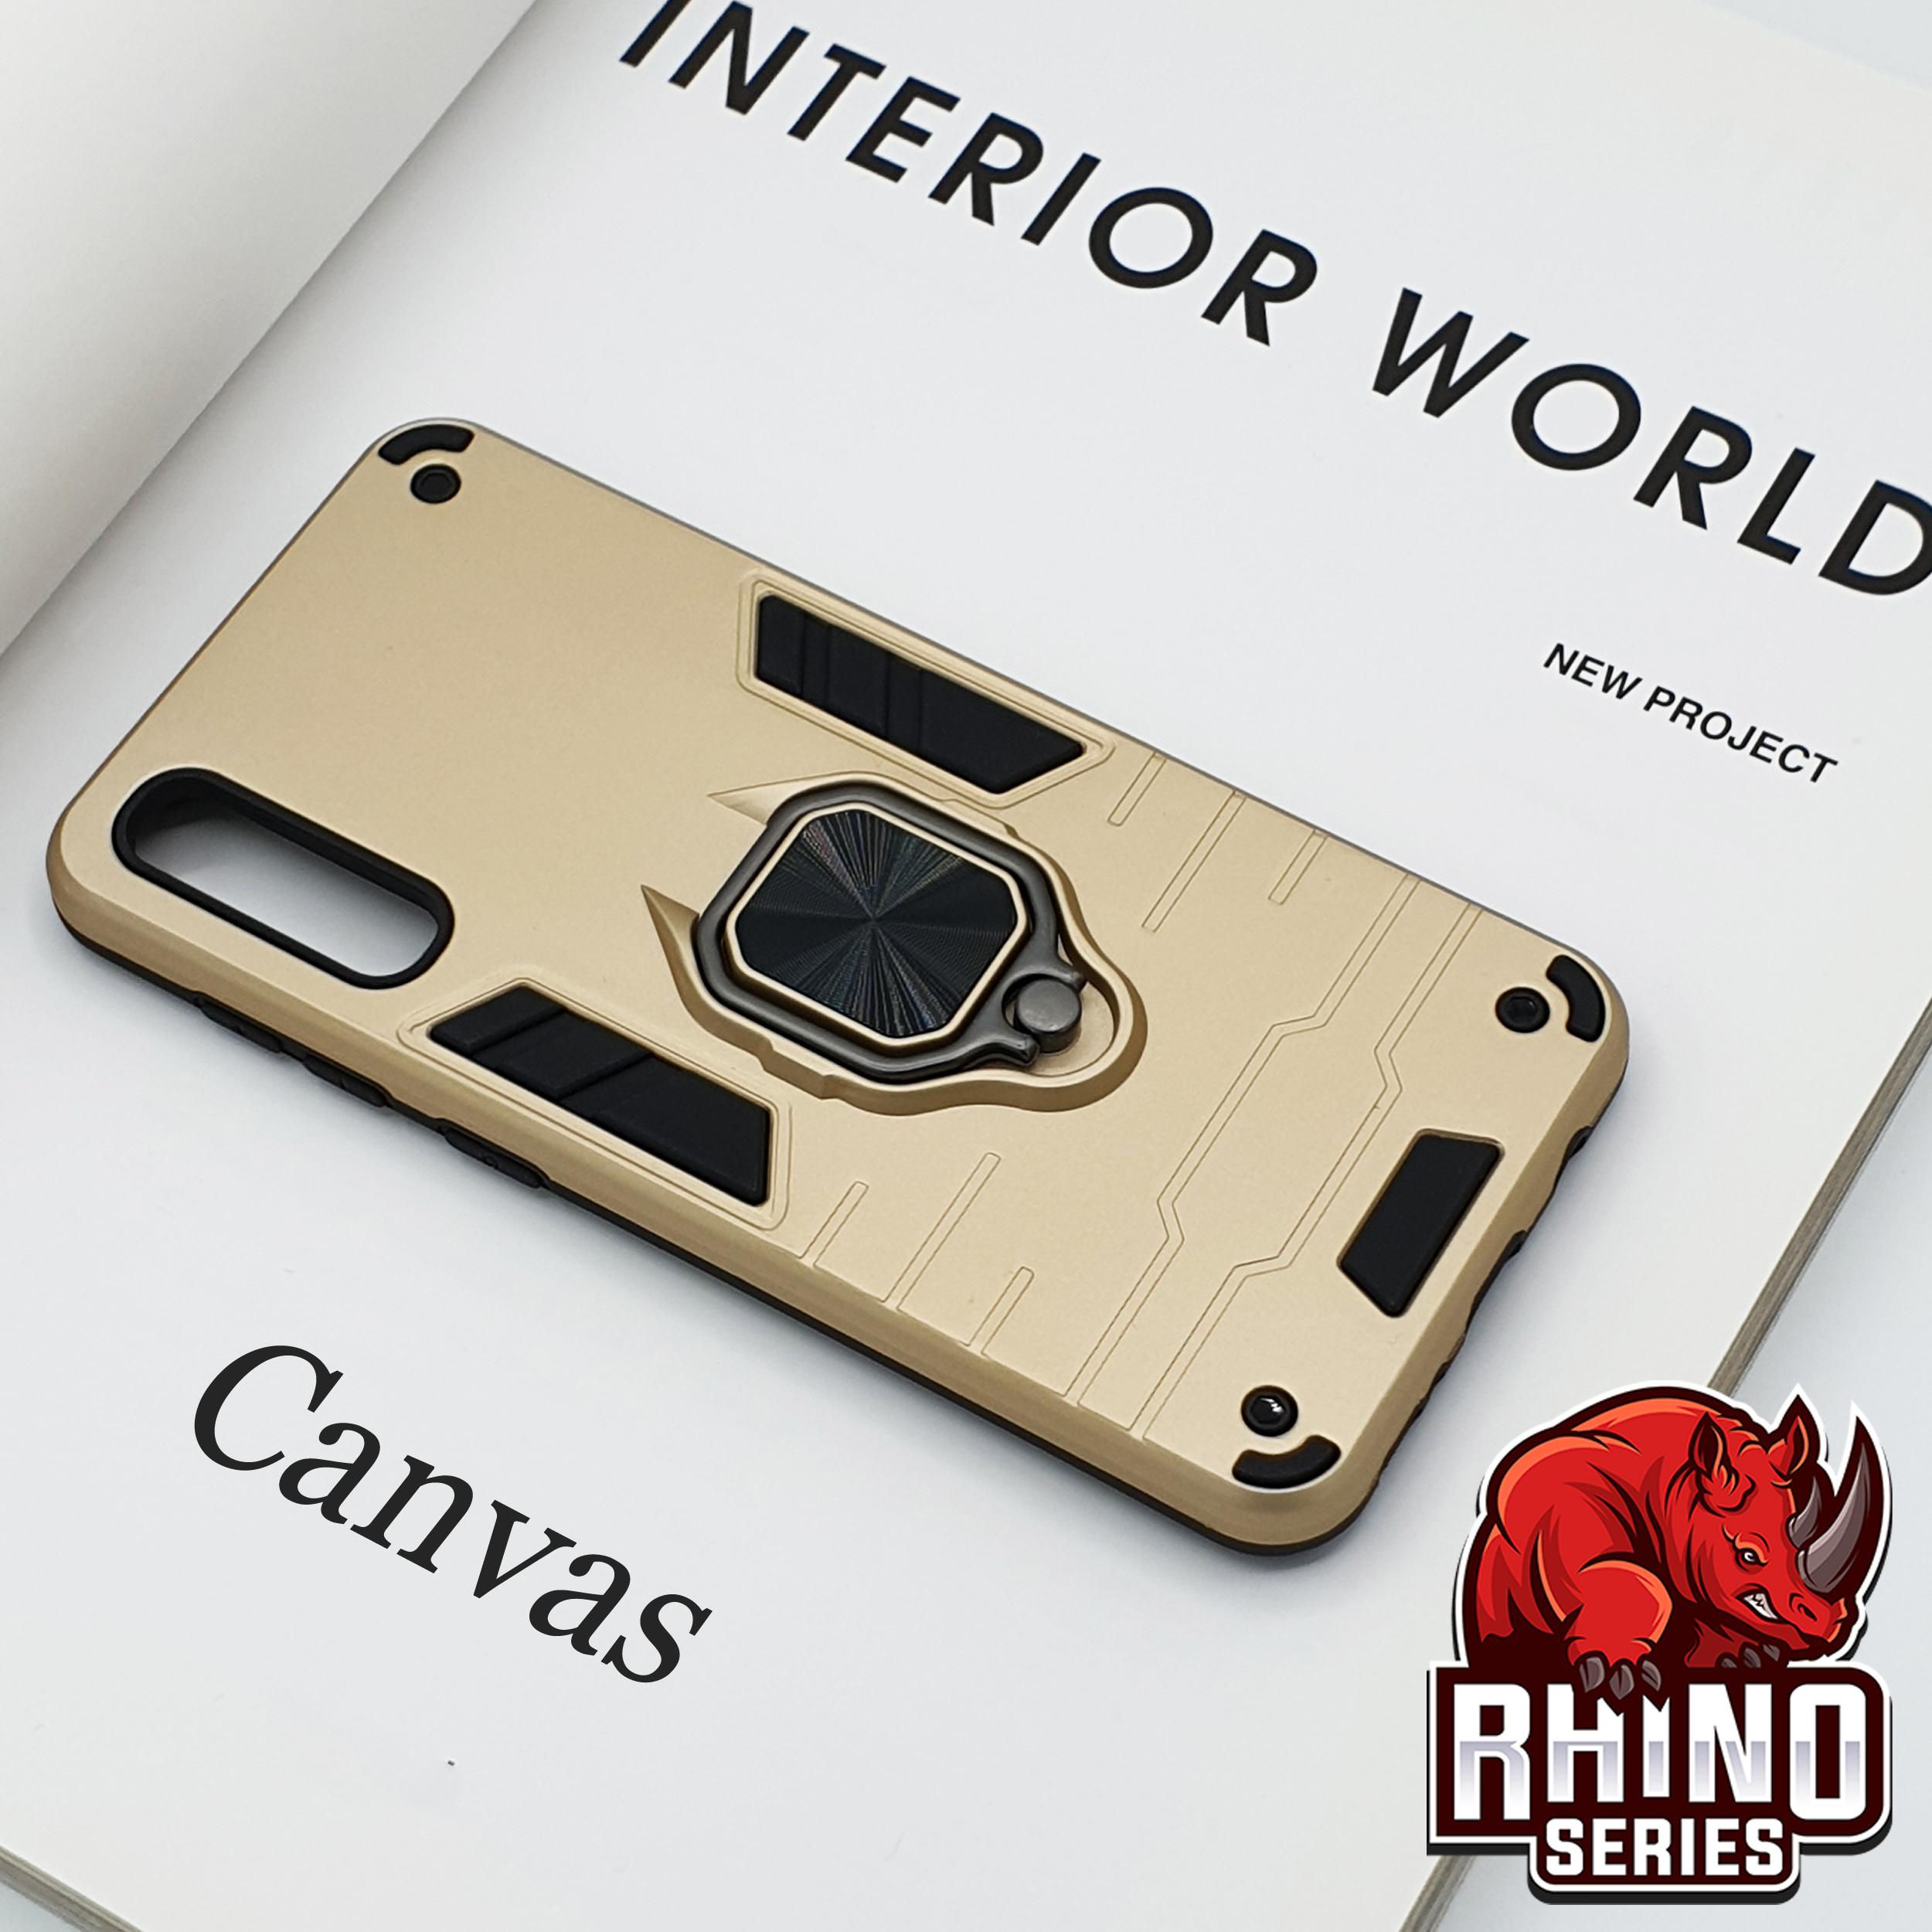 کاور کانواس مدل RHINO SERIES مناسب برای گوشی موبایل سامسونگ Galaxy A50s/A30s/A50 main 1 1